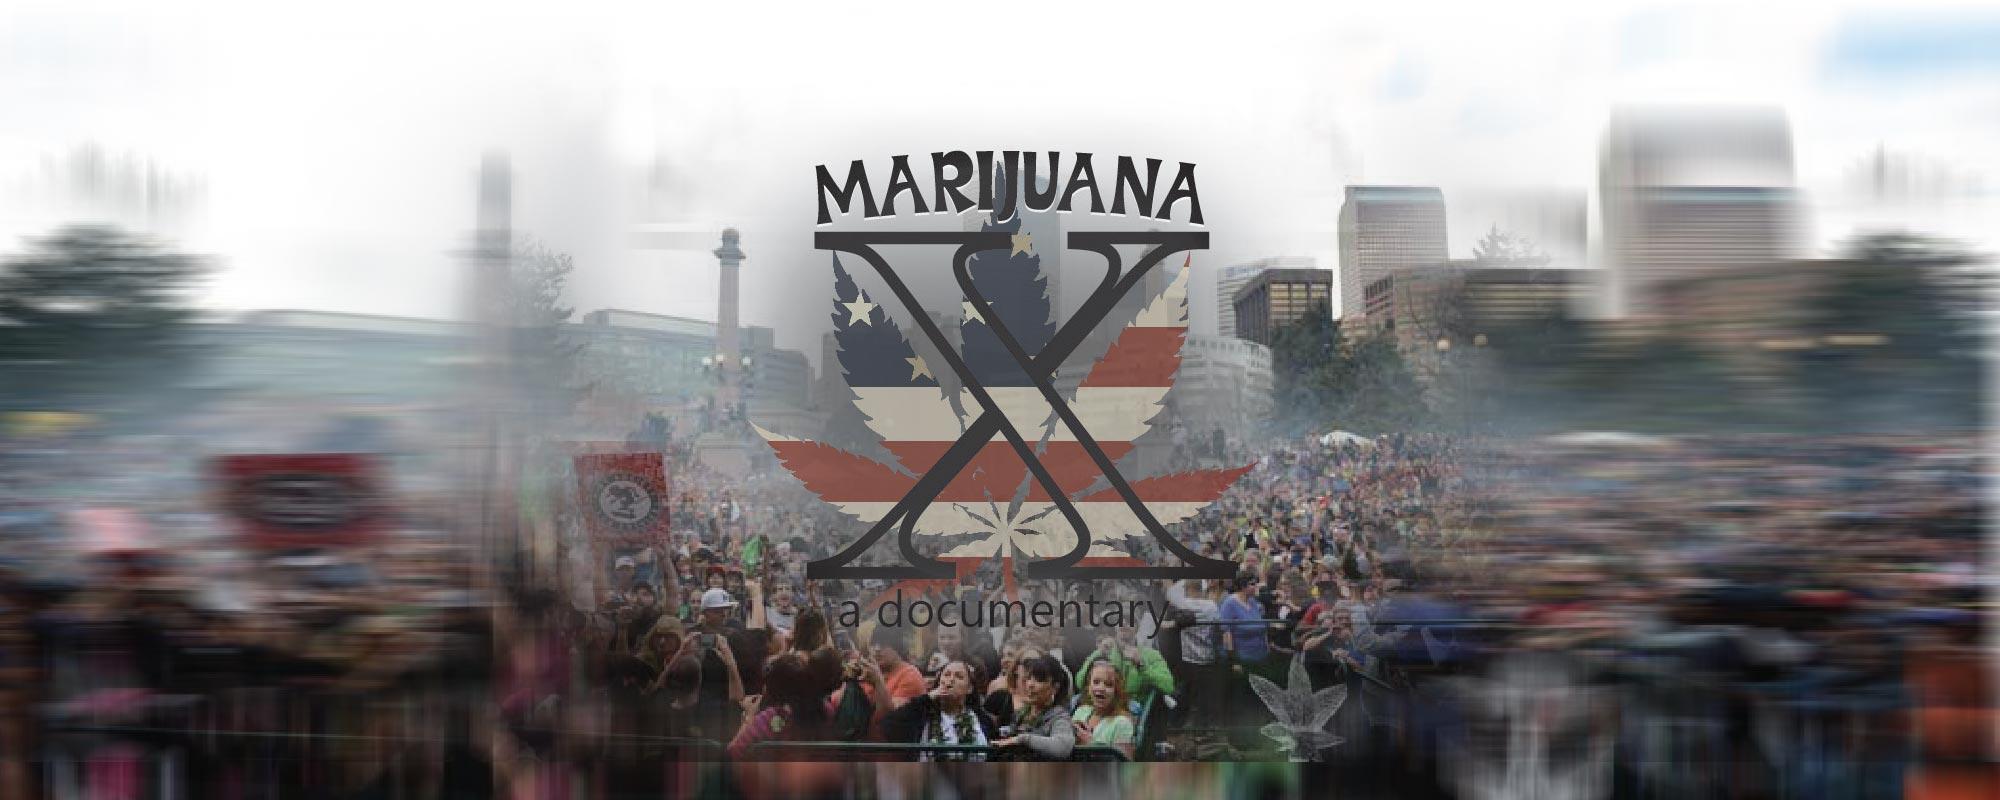 Marijuana x cover image